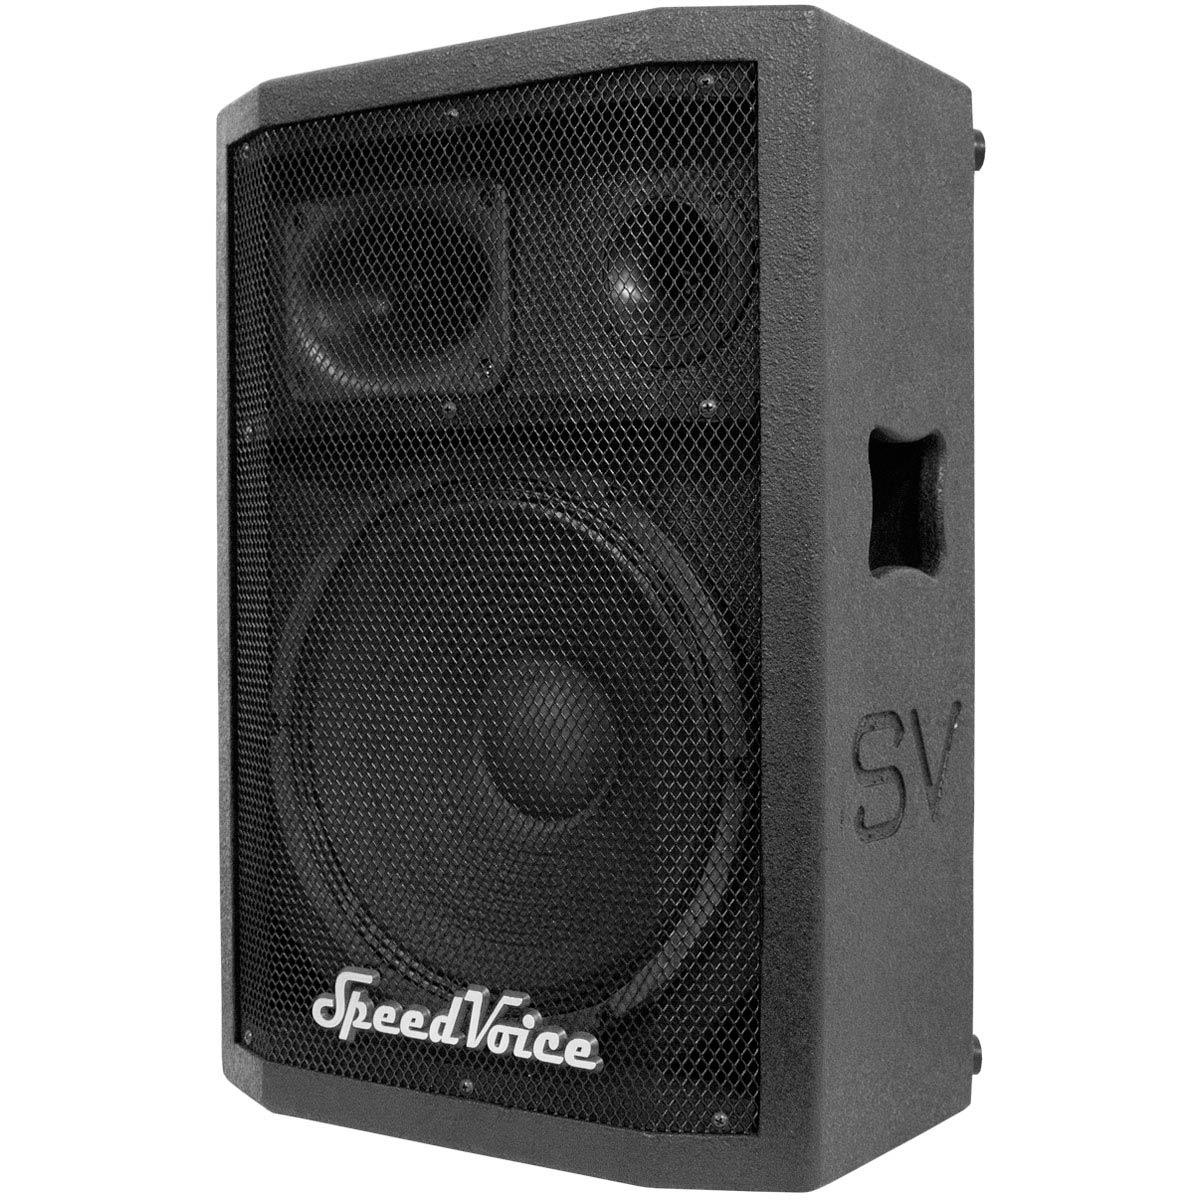 Caixa Passiva Fal 15 Pol 200W - SVX 15 Speed Voice